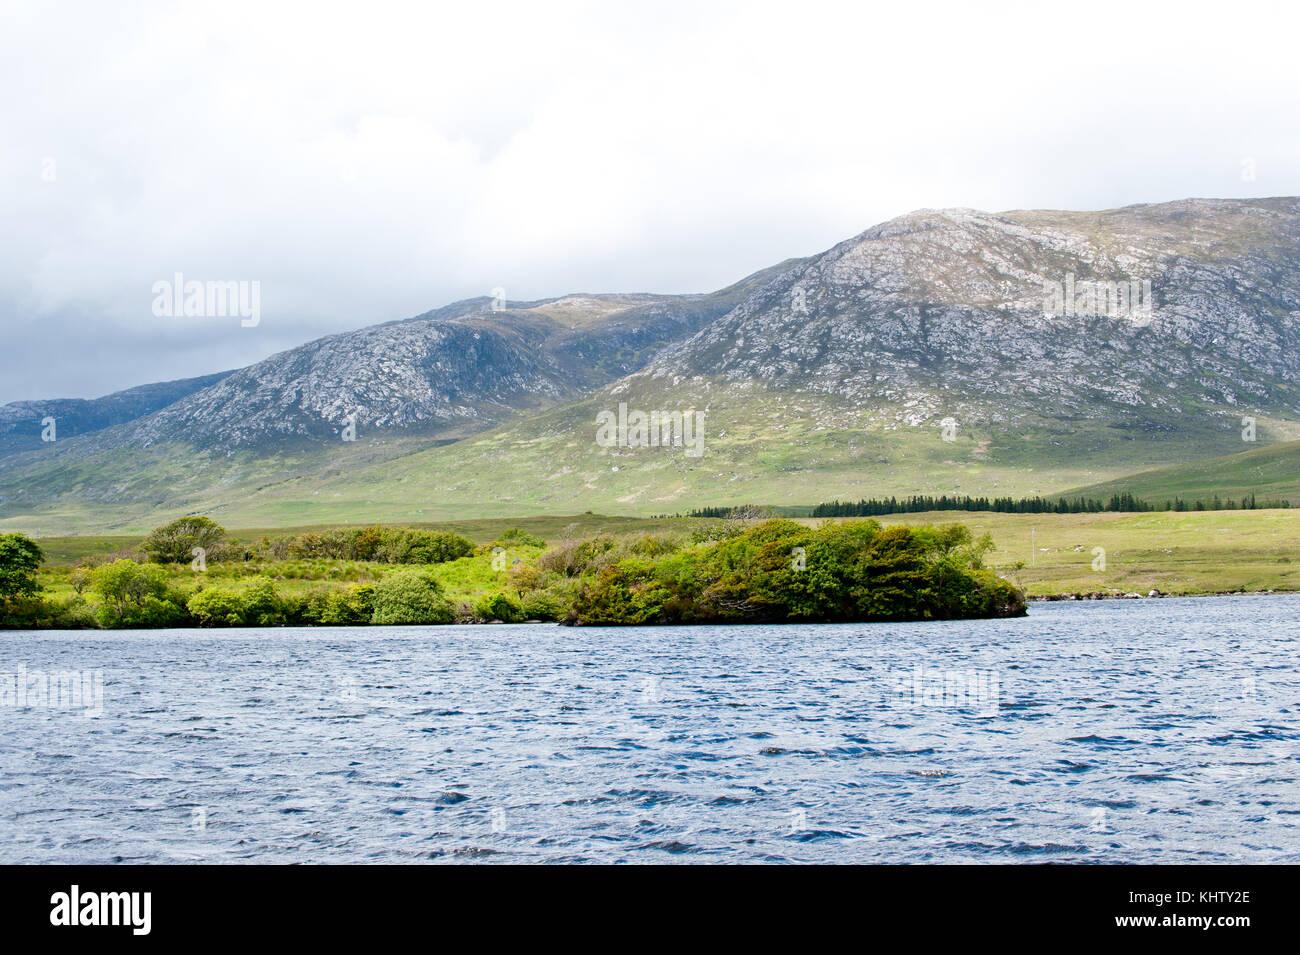 Connemara National Park, co Galway, Ireland - Stock Image